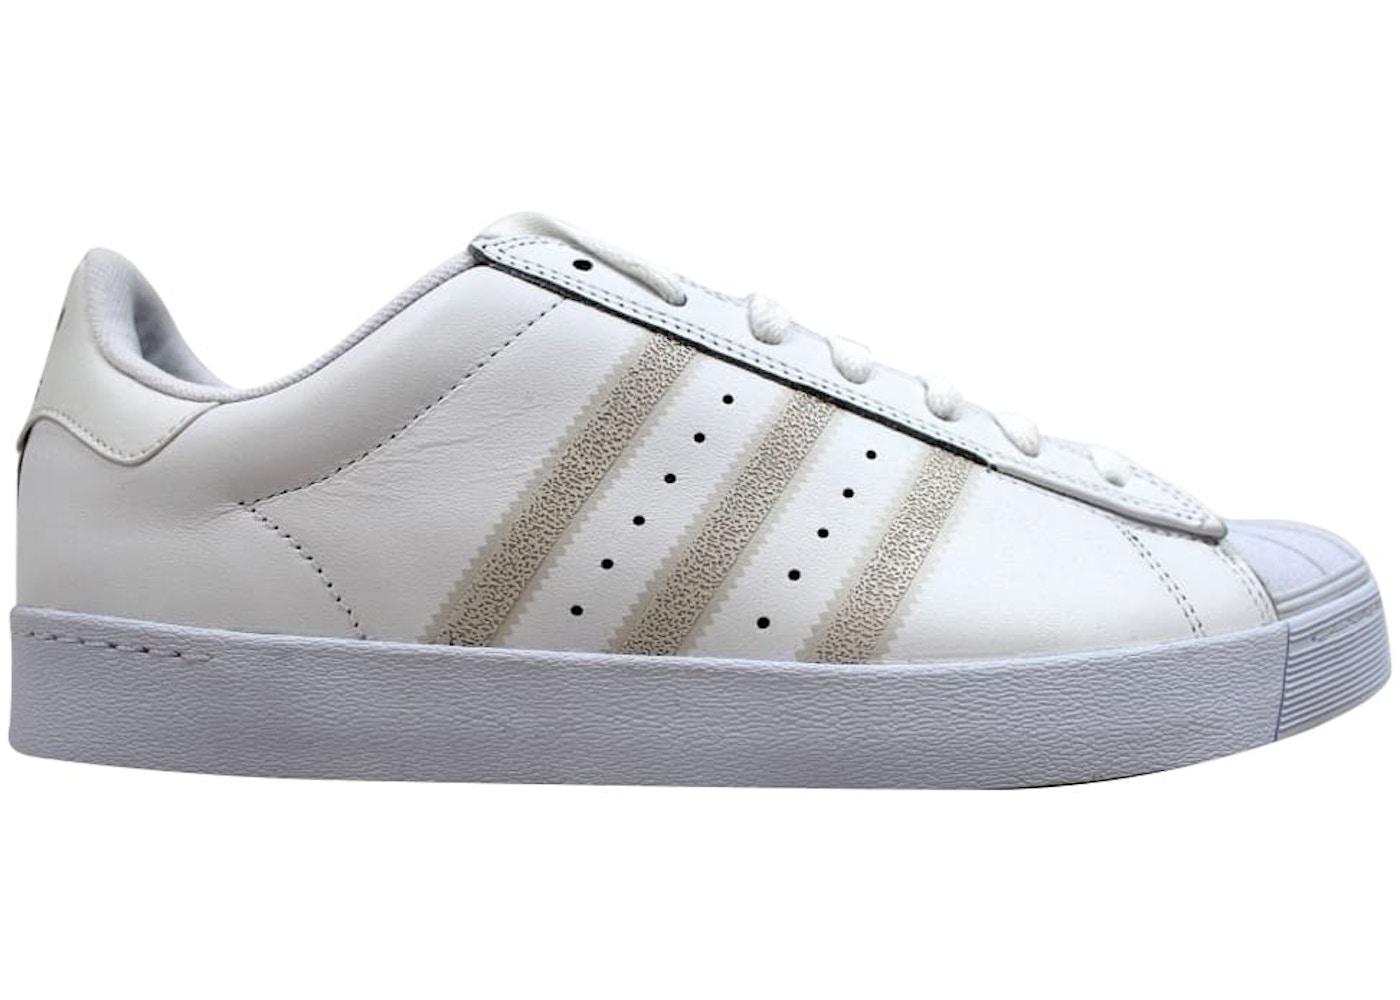 brand new 1f5aa e92f2 adidas Superstar Vulc White/White-Silver Metallic